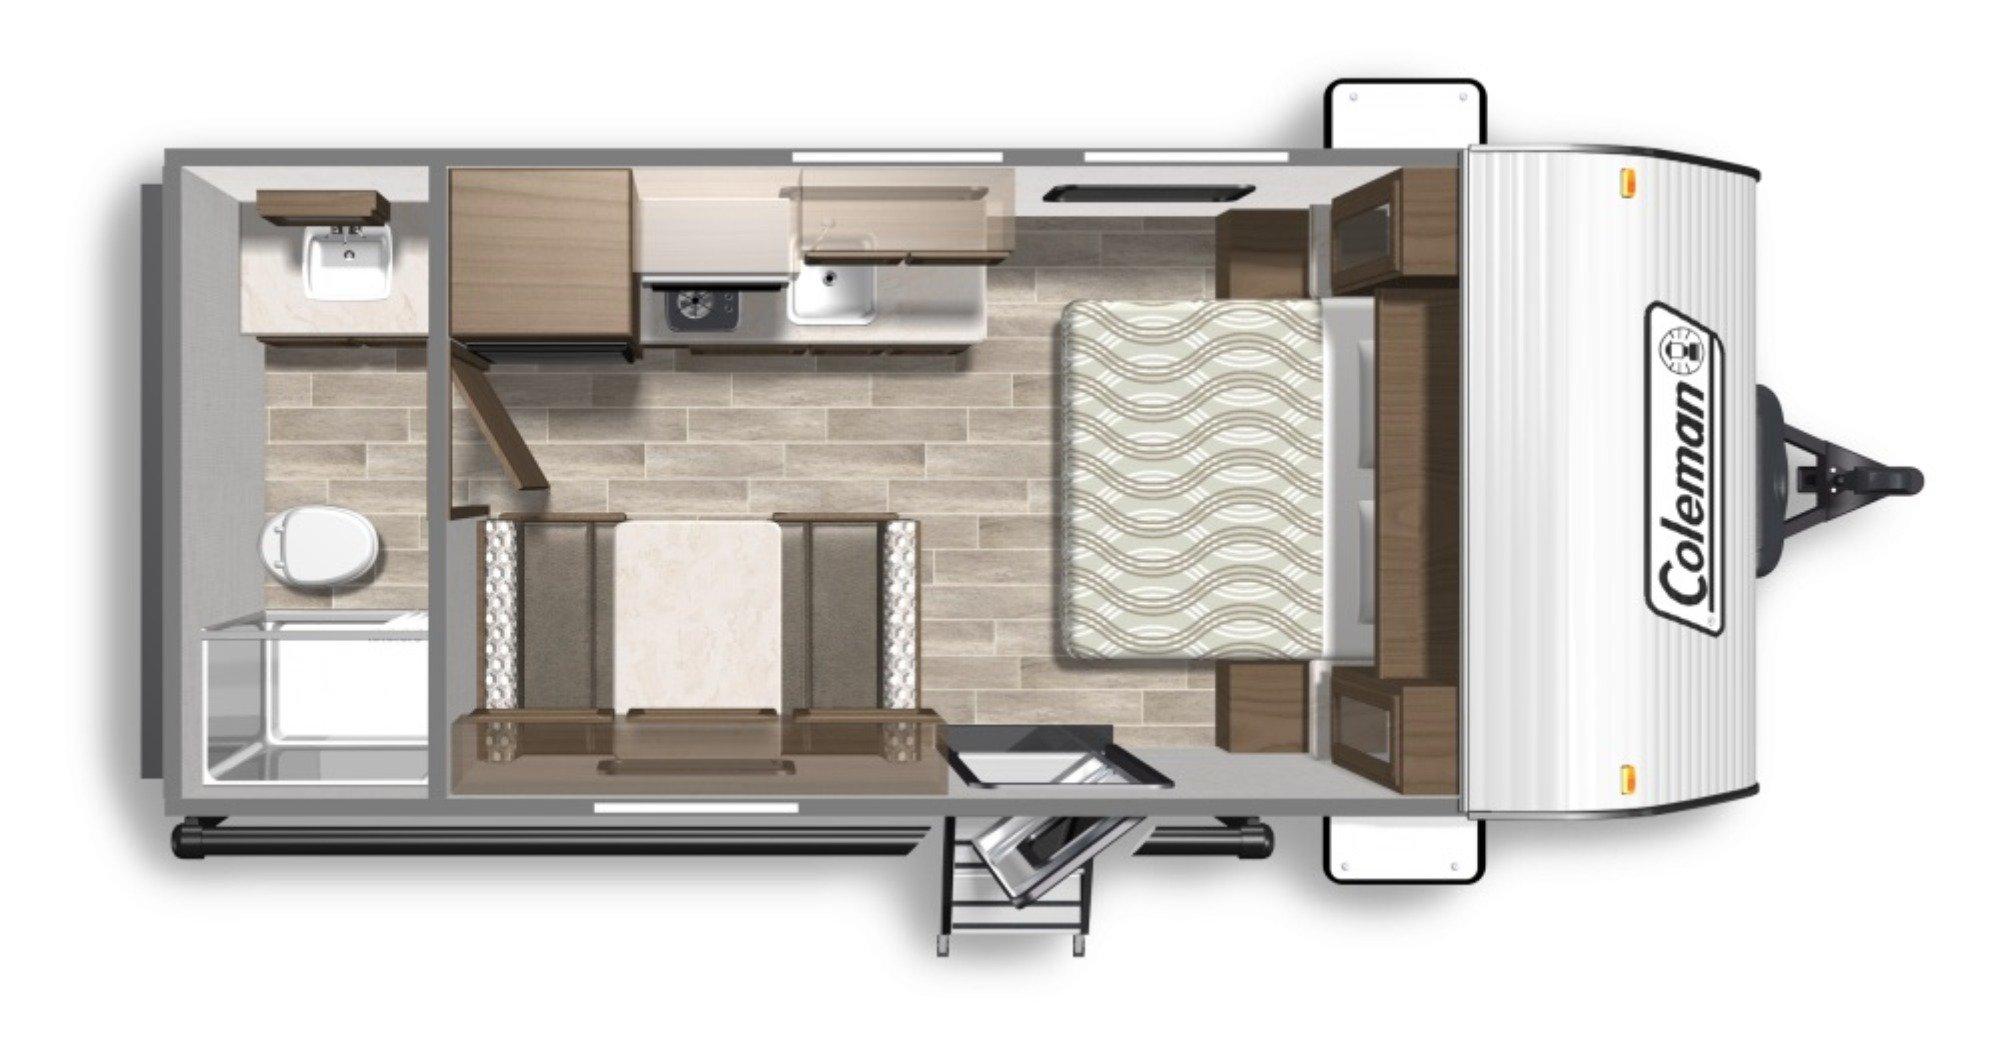 View Floor Plan for 2020 COLEMAN COLEMAN LANTERN LT 18RB